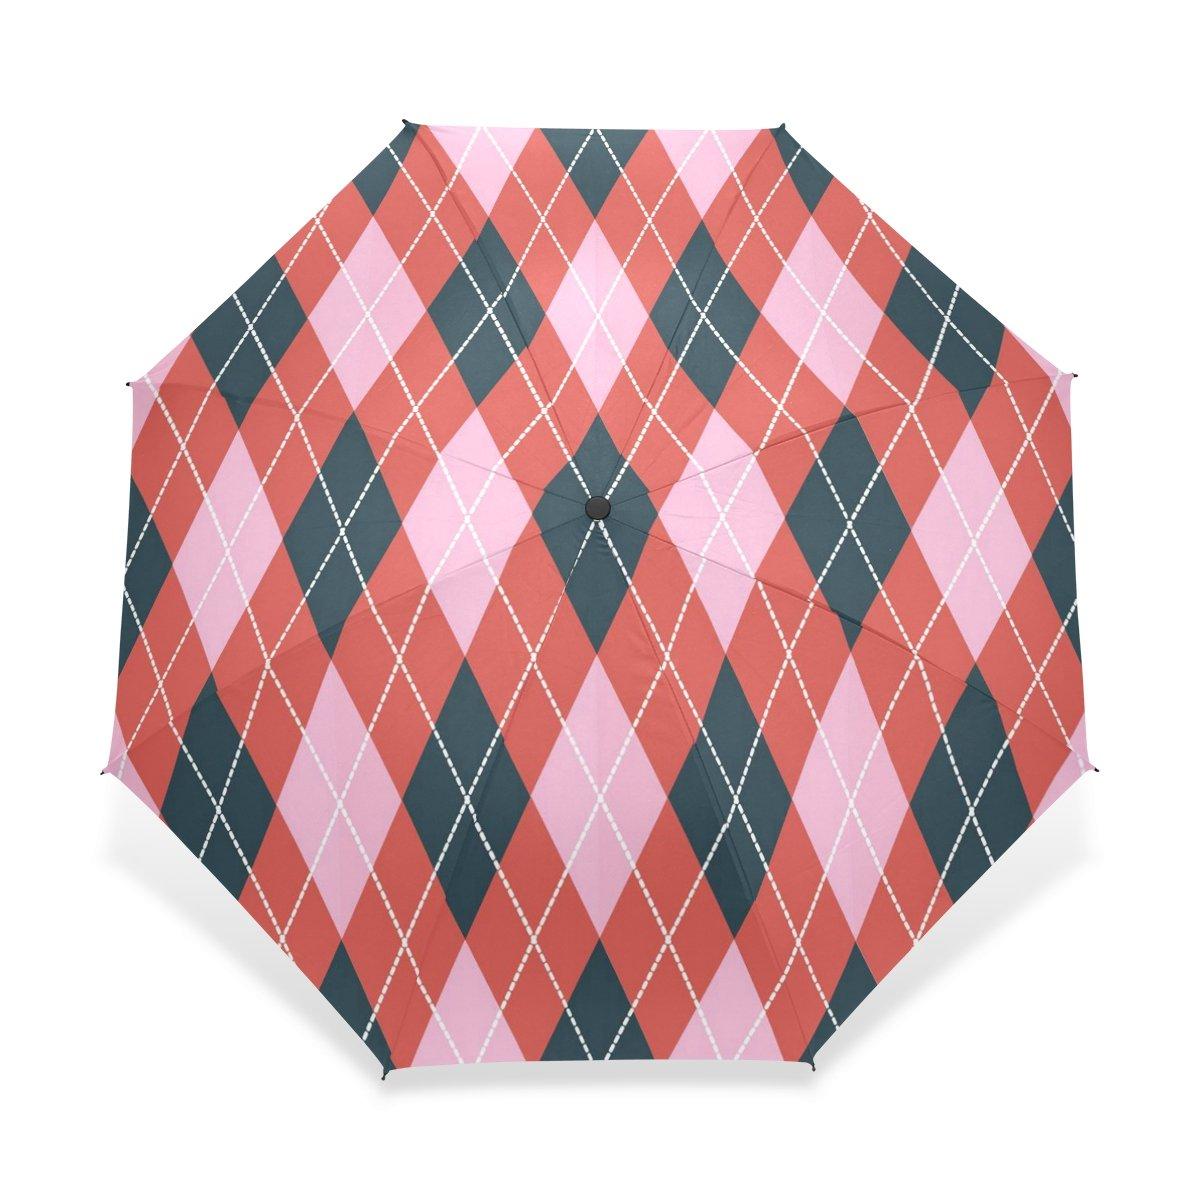 baihuishop防風強力なフレームUnbreakableアーガイルパターンゴルフ傘、コンパクトで旅行for Easy Carryingスポーツ雨傘   B01GZWA4NO